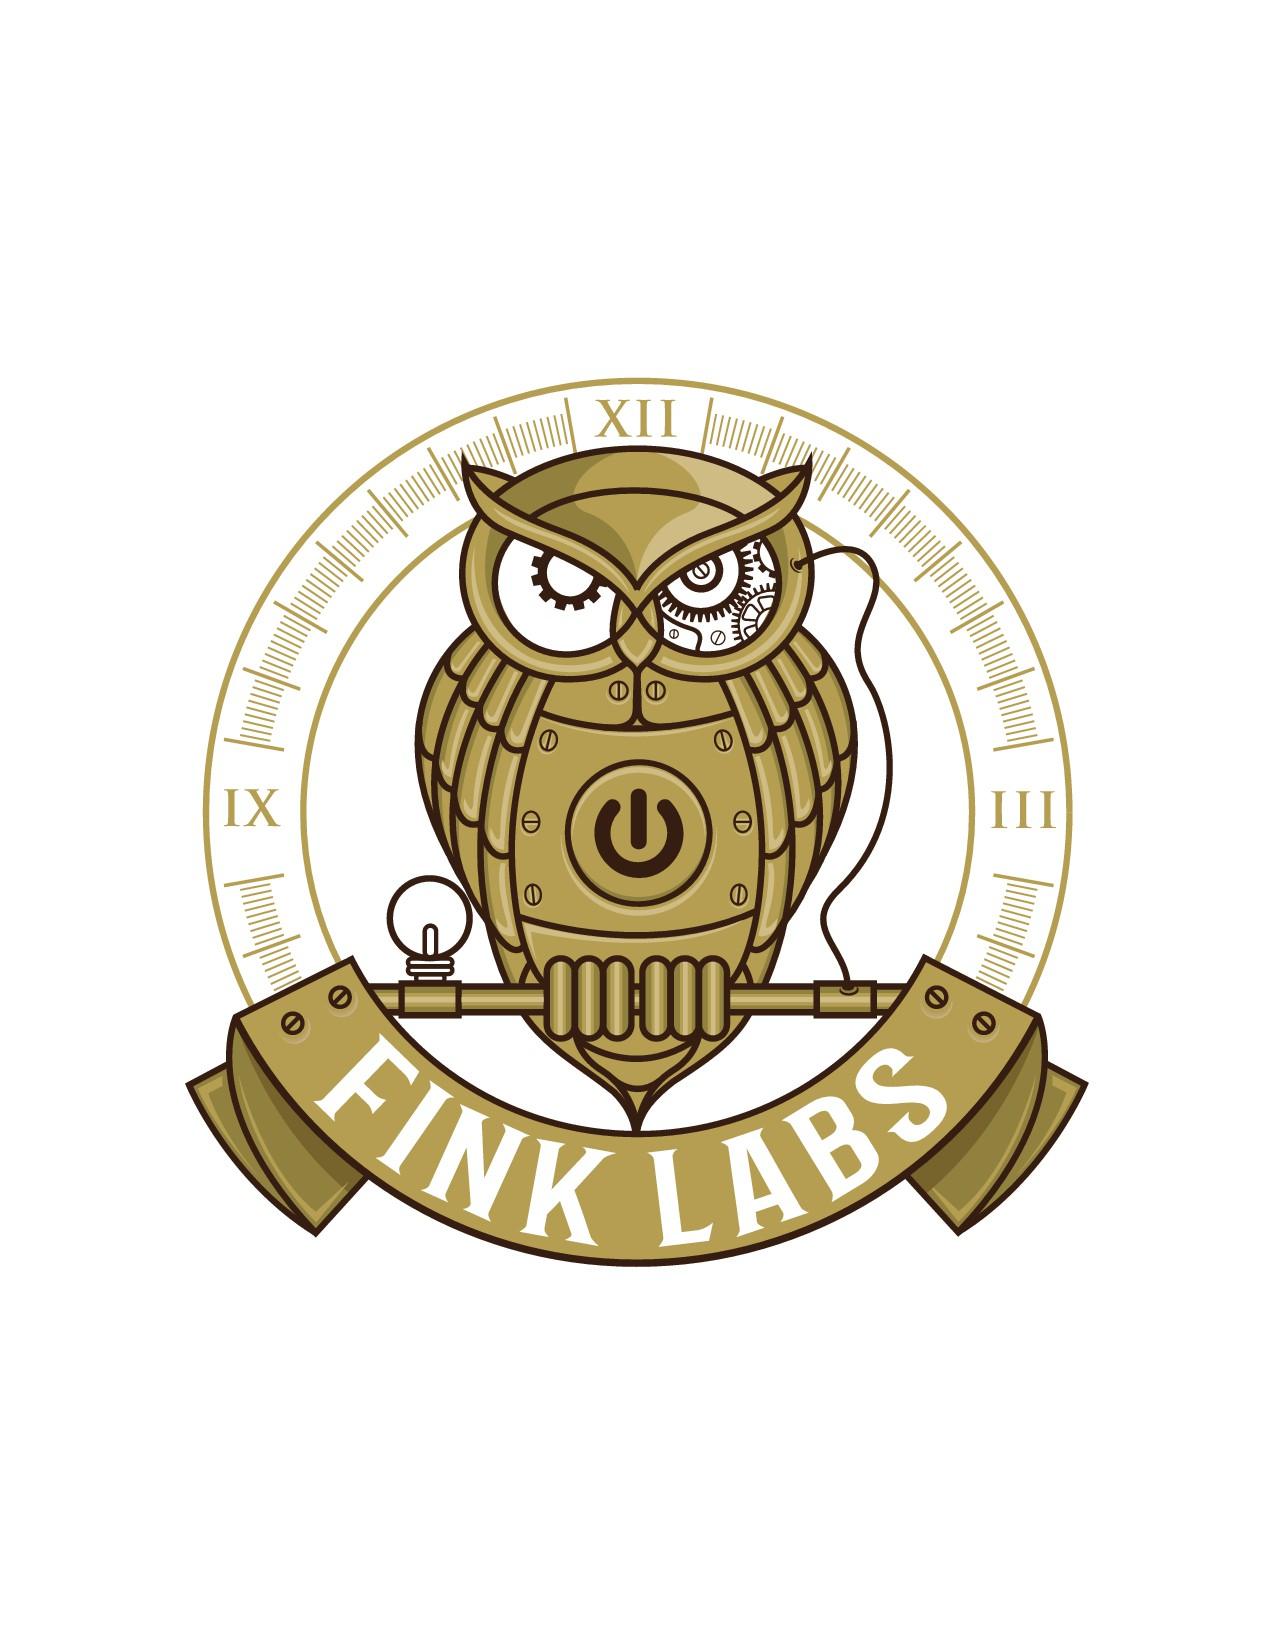 steampunk logo for innovative technology company